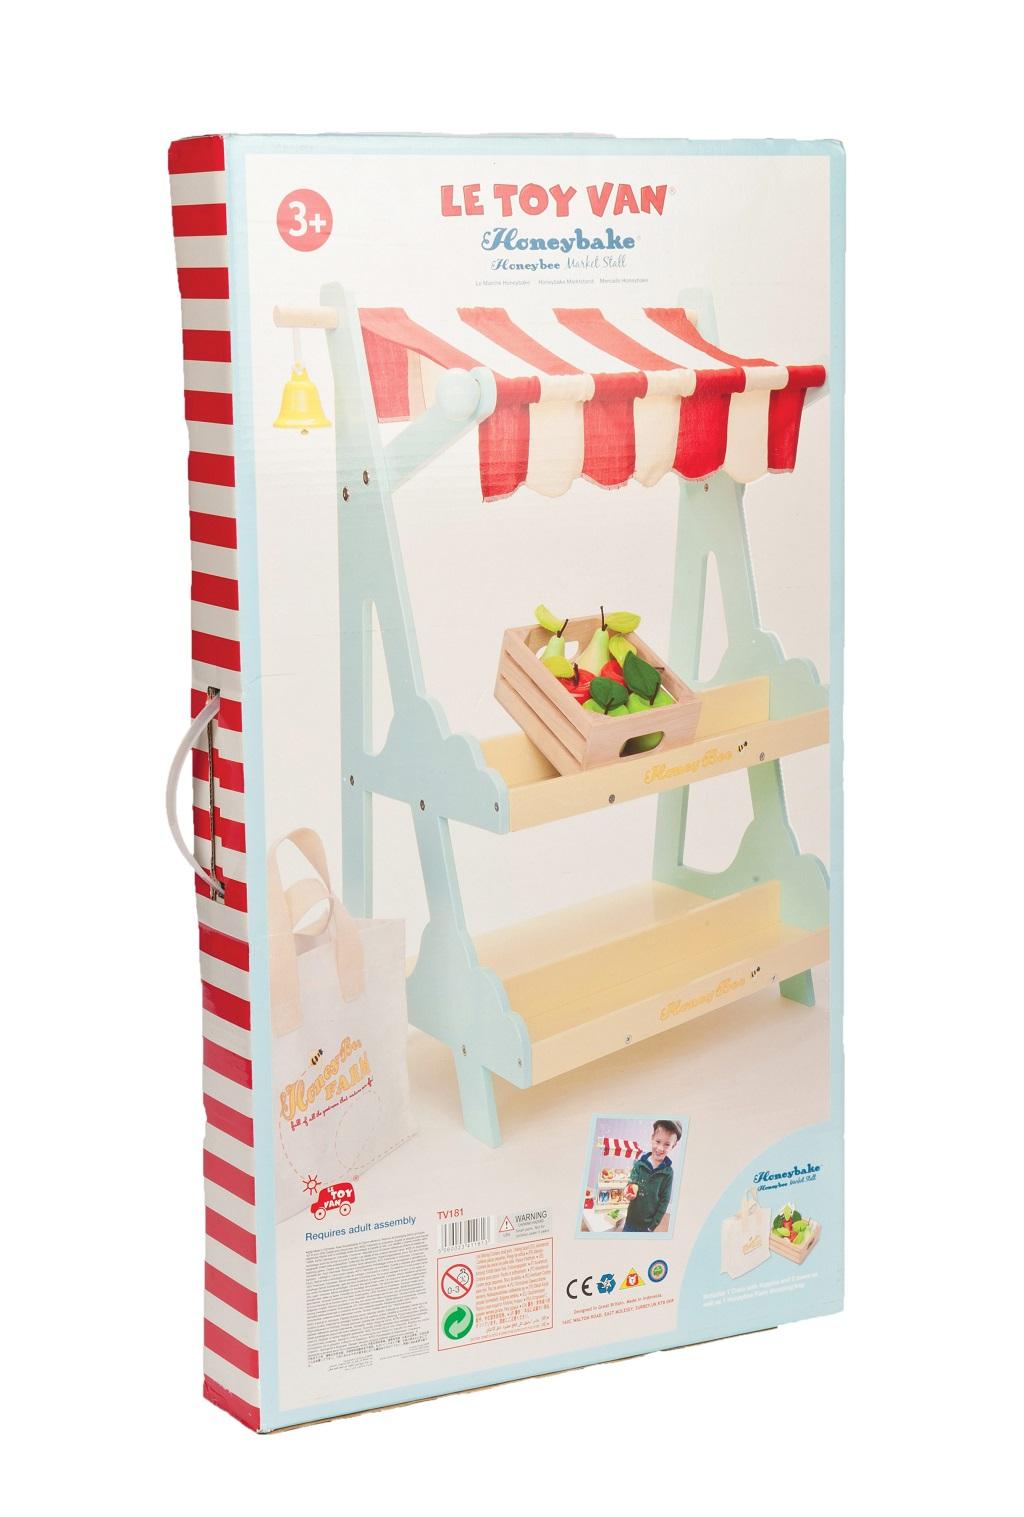 Le Toy Van Prodejní stánek Honeybake